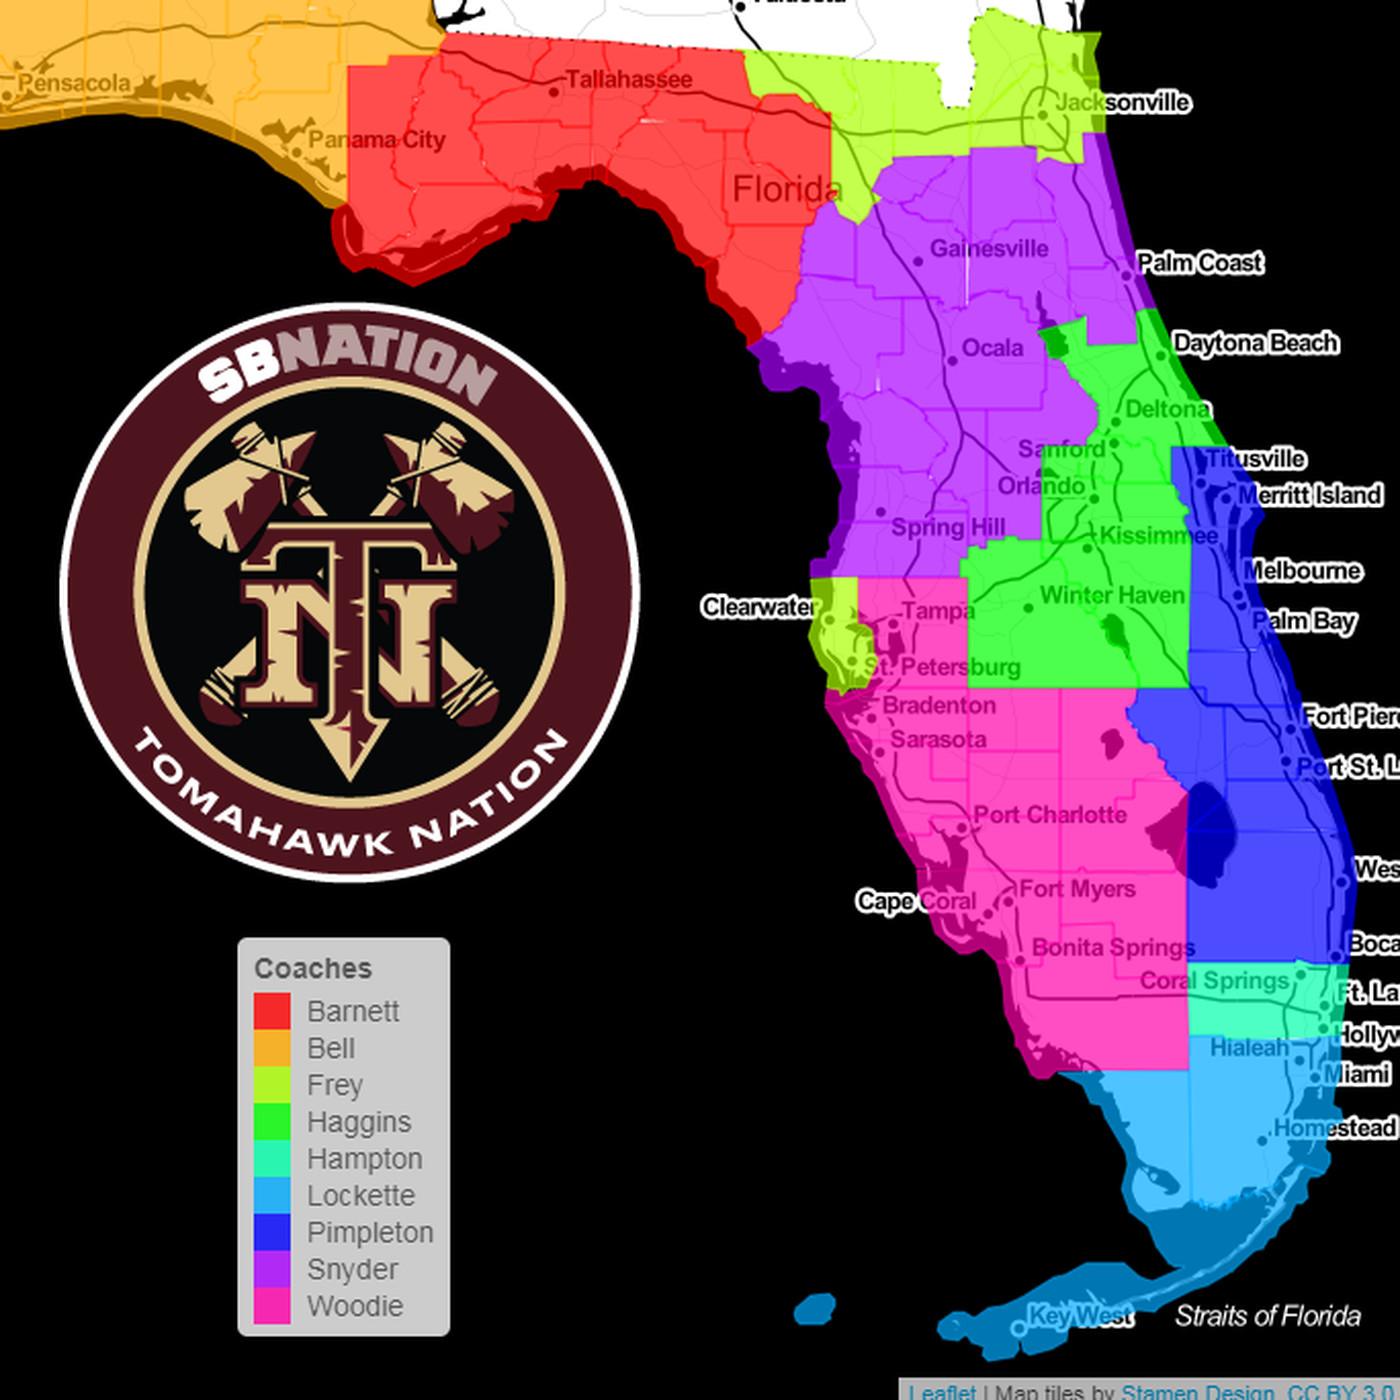 Florida State Football Coach Recruiting Territories In Florida